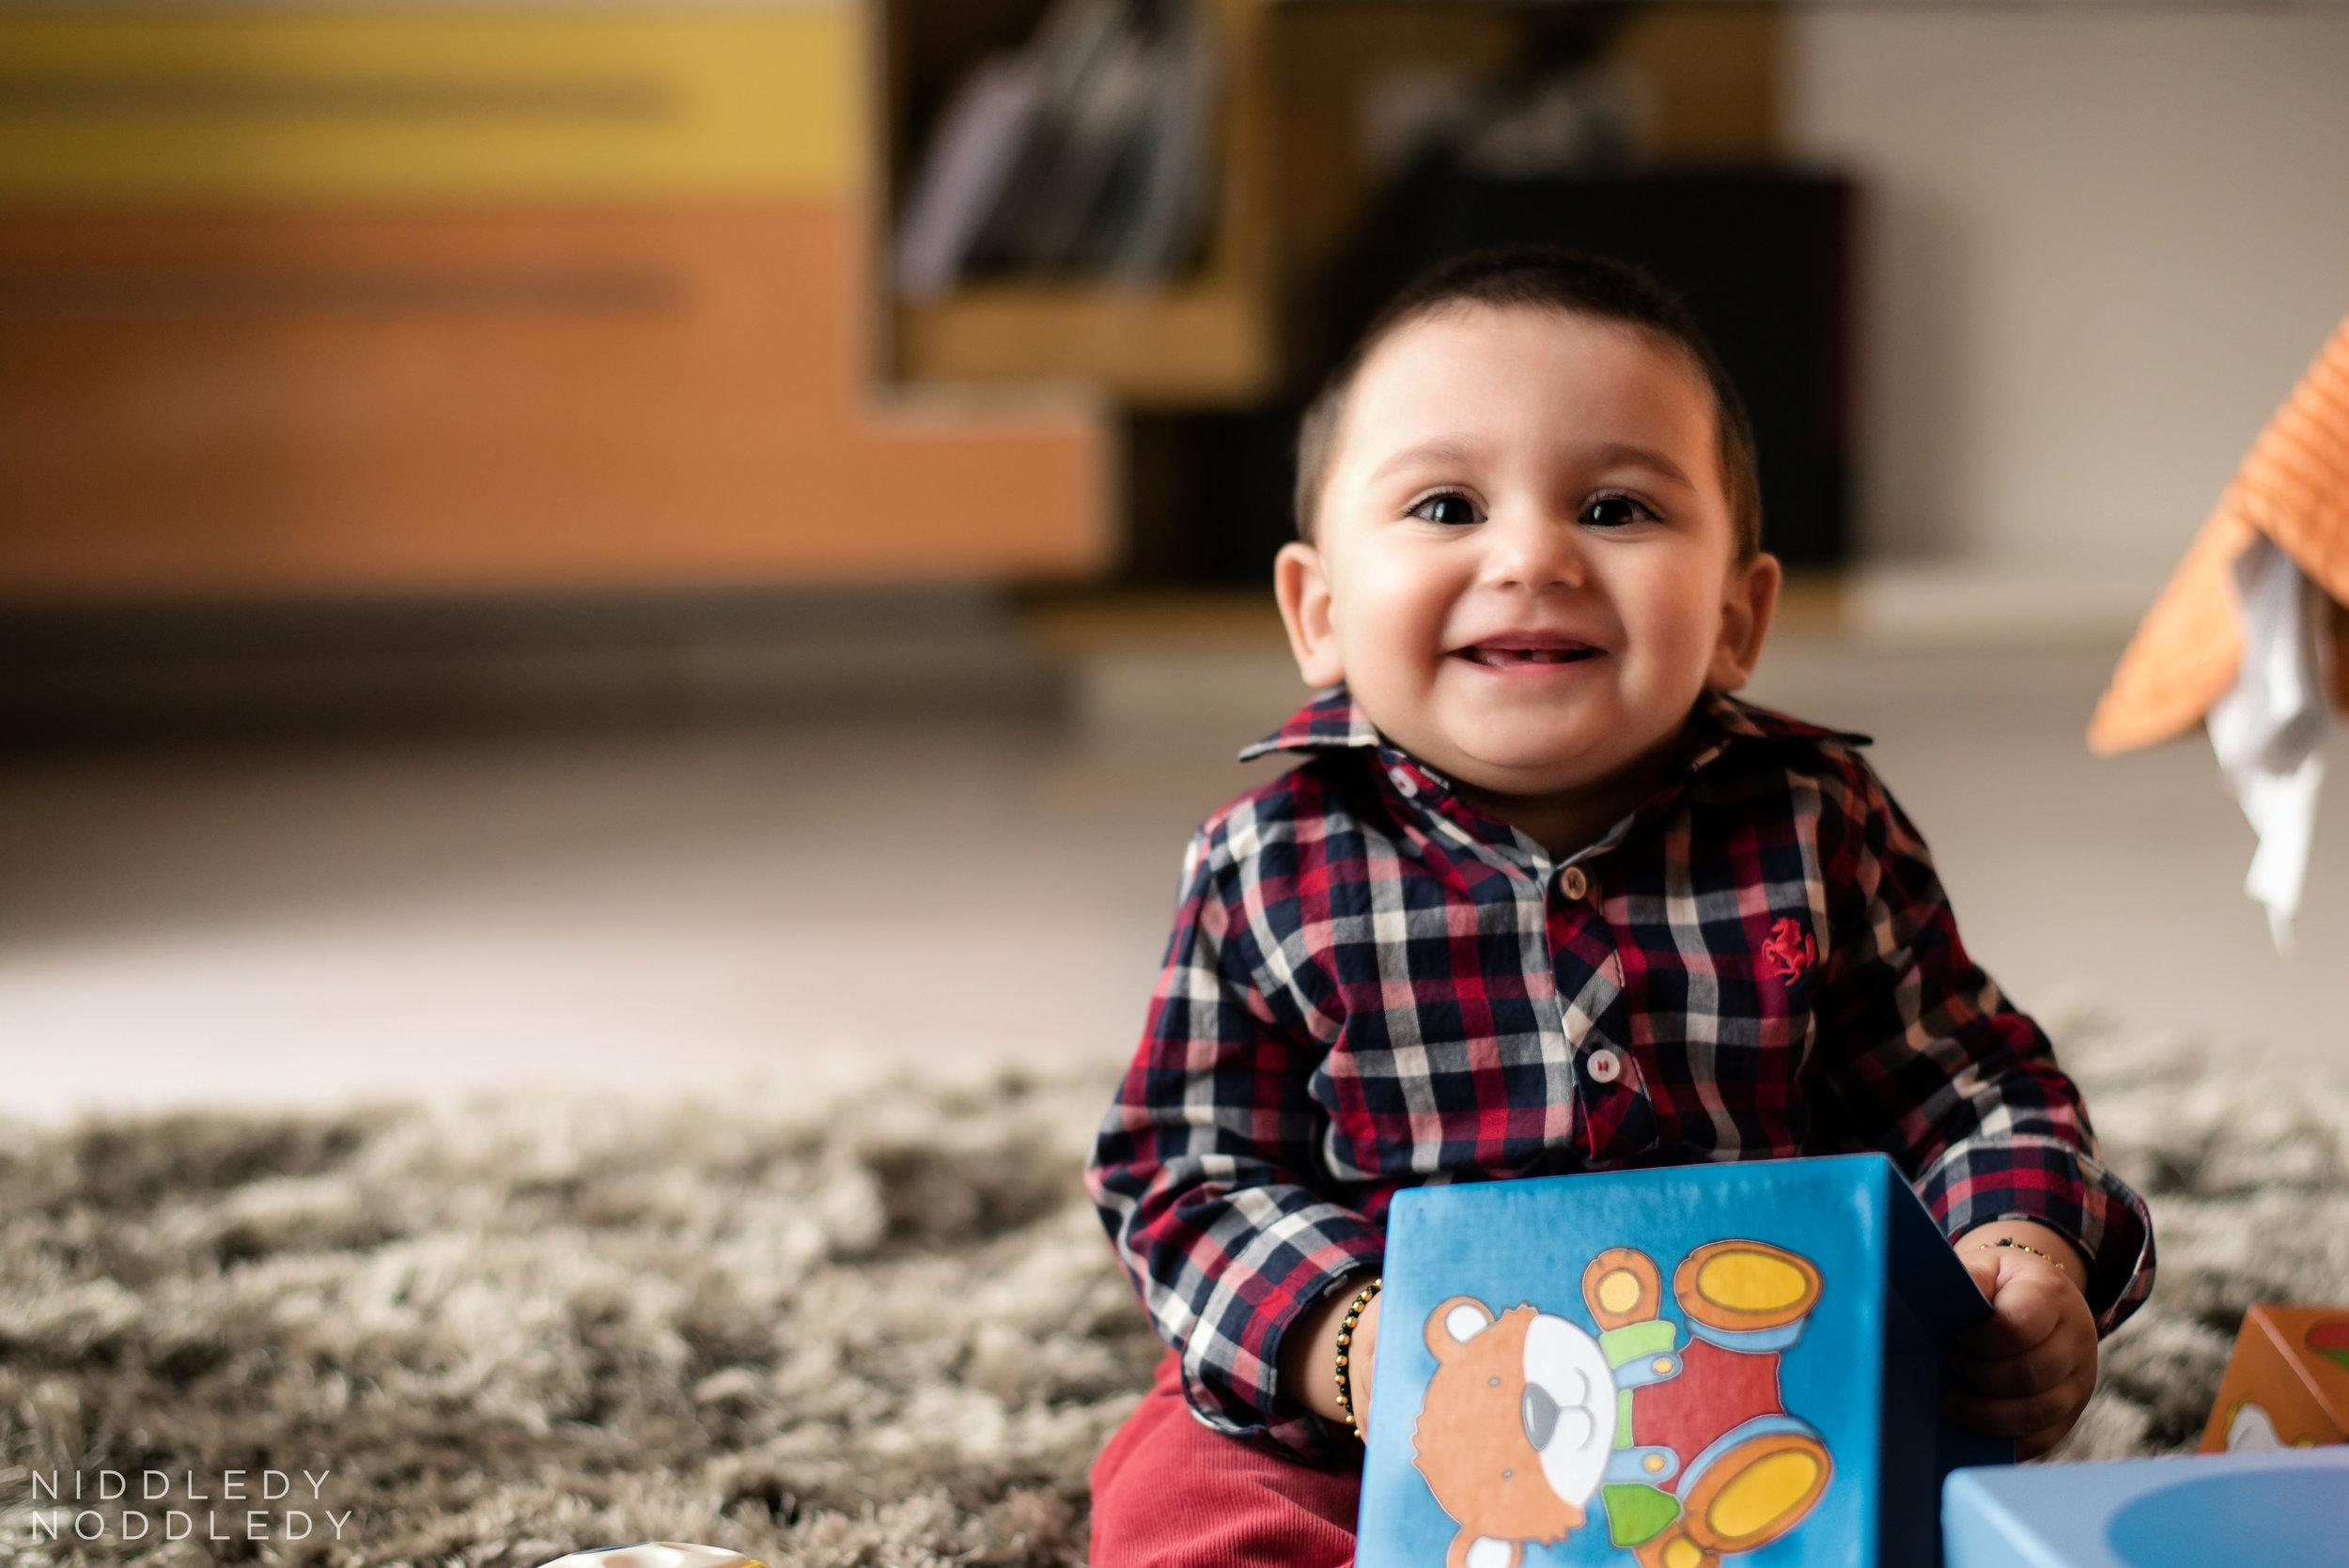 Shivaya-Yajur Twins Photoshoot ❤ NiddledyNoddledy.com ~ Bumps to Babies Photography, Kolkata - 01.jpg